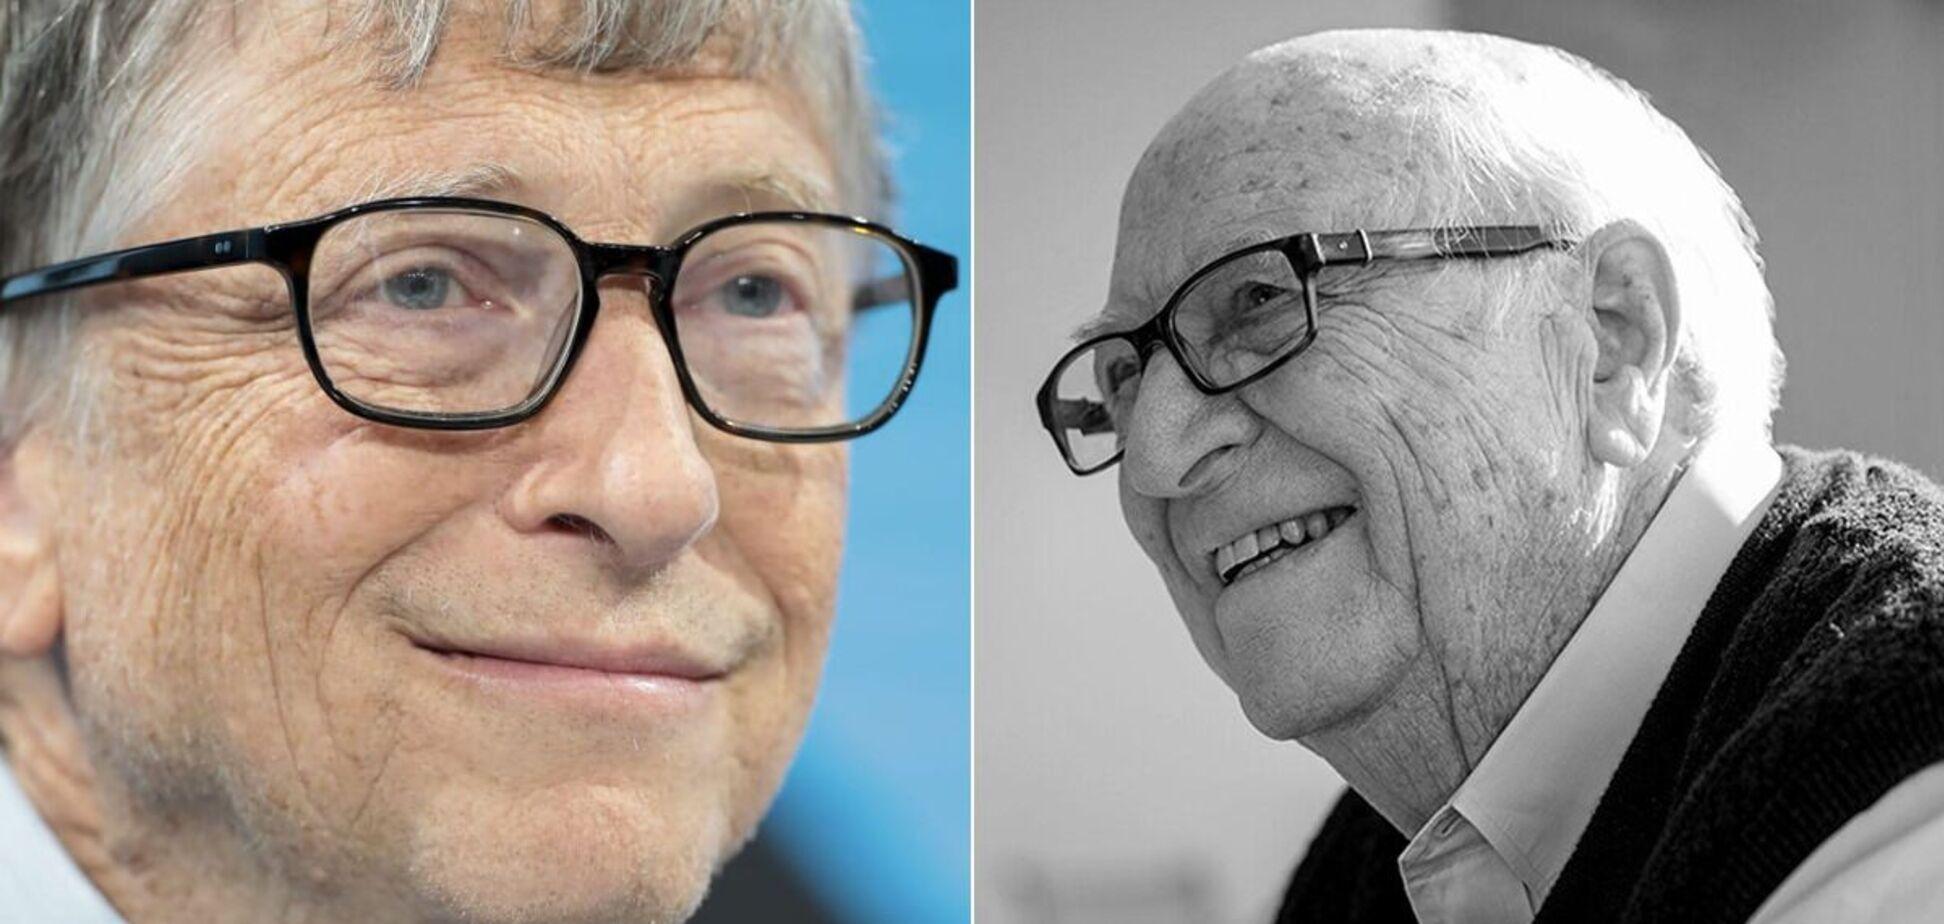 Білл Гейтс старший помер